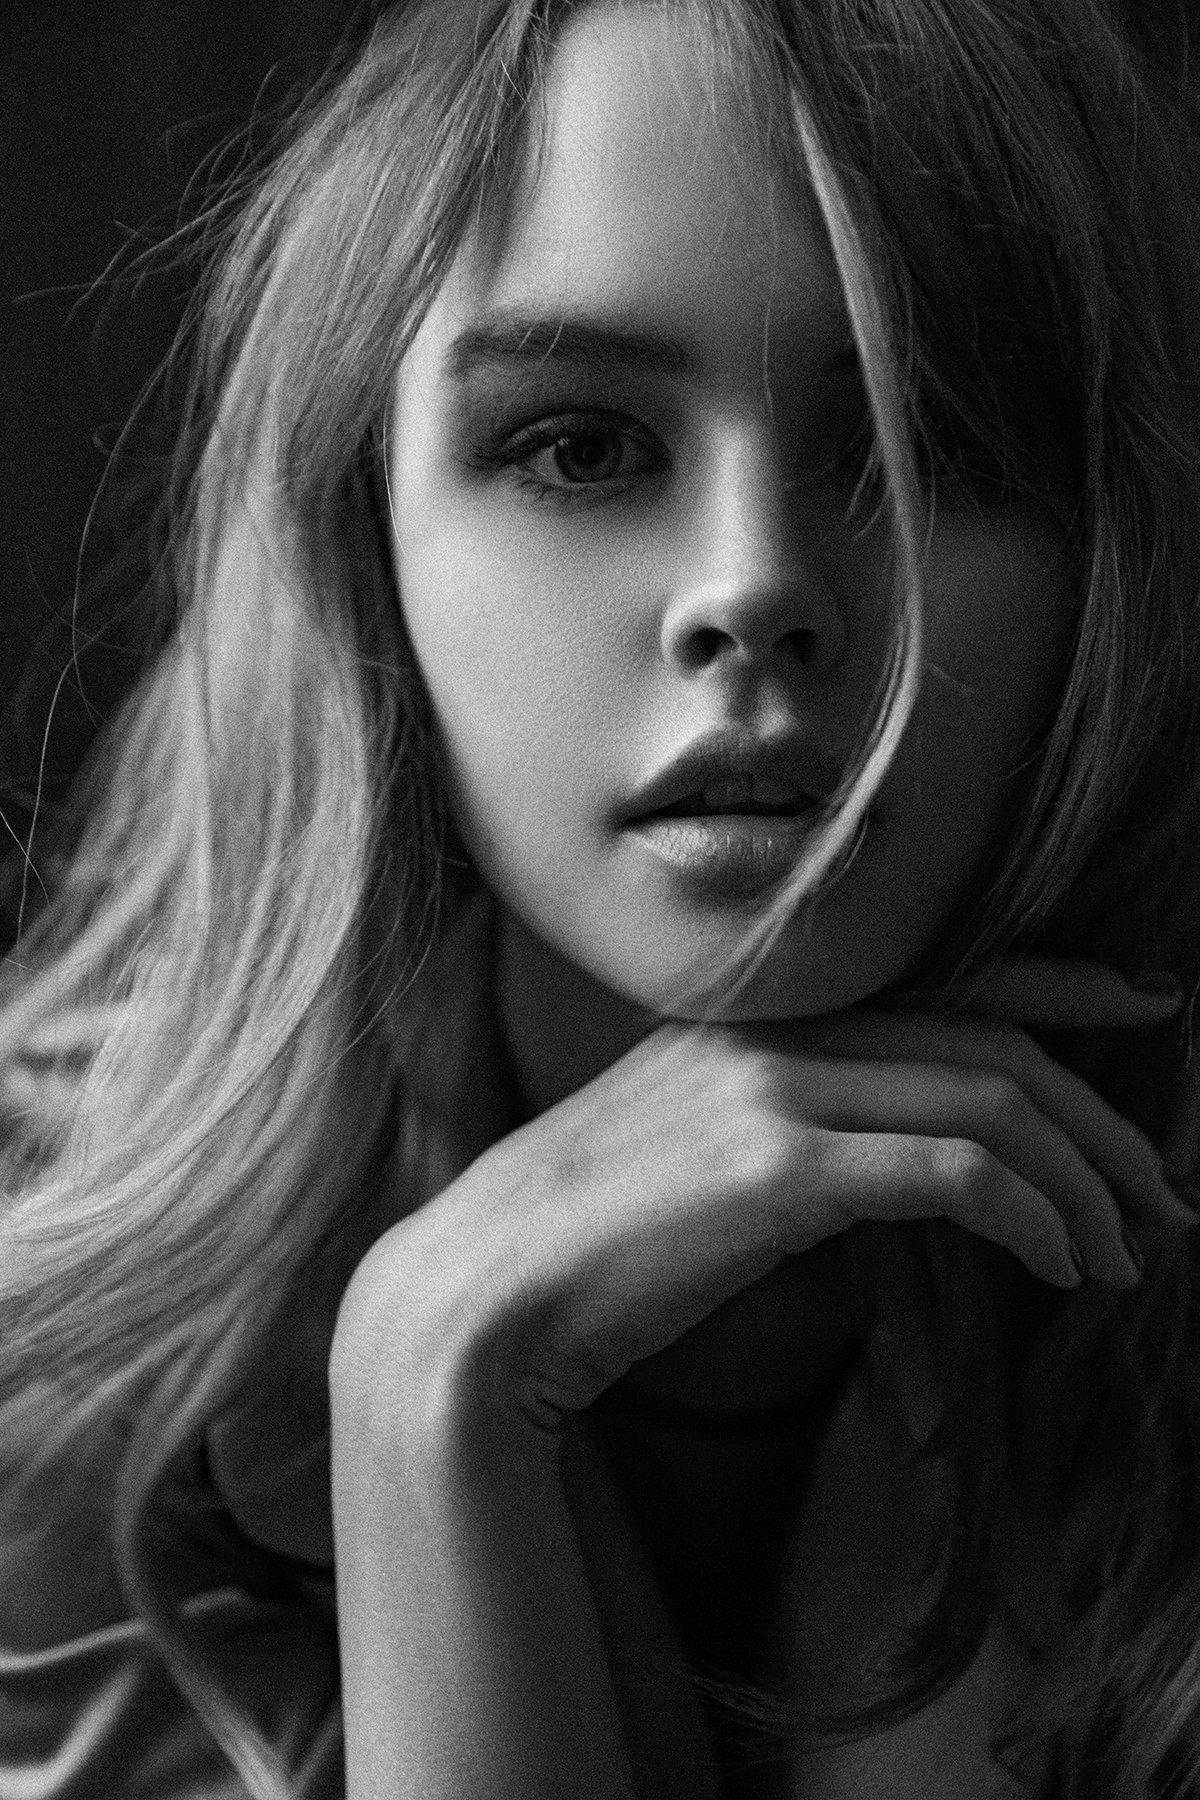 Young Anastasiya Scheglova nude photos 2019